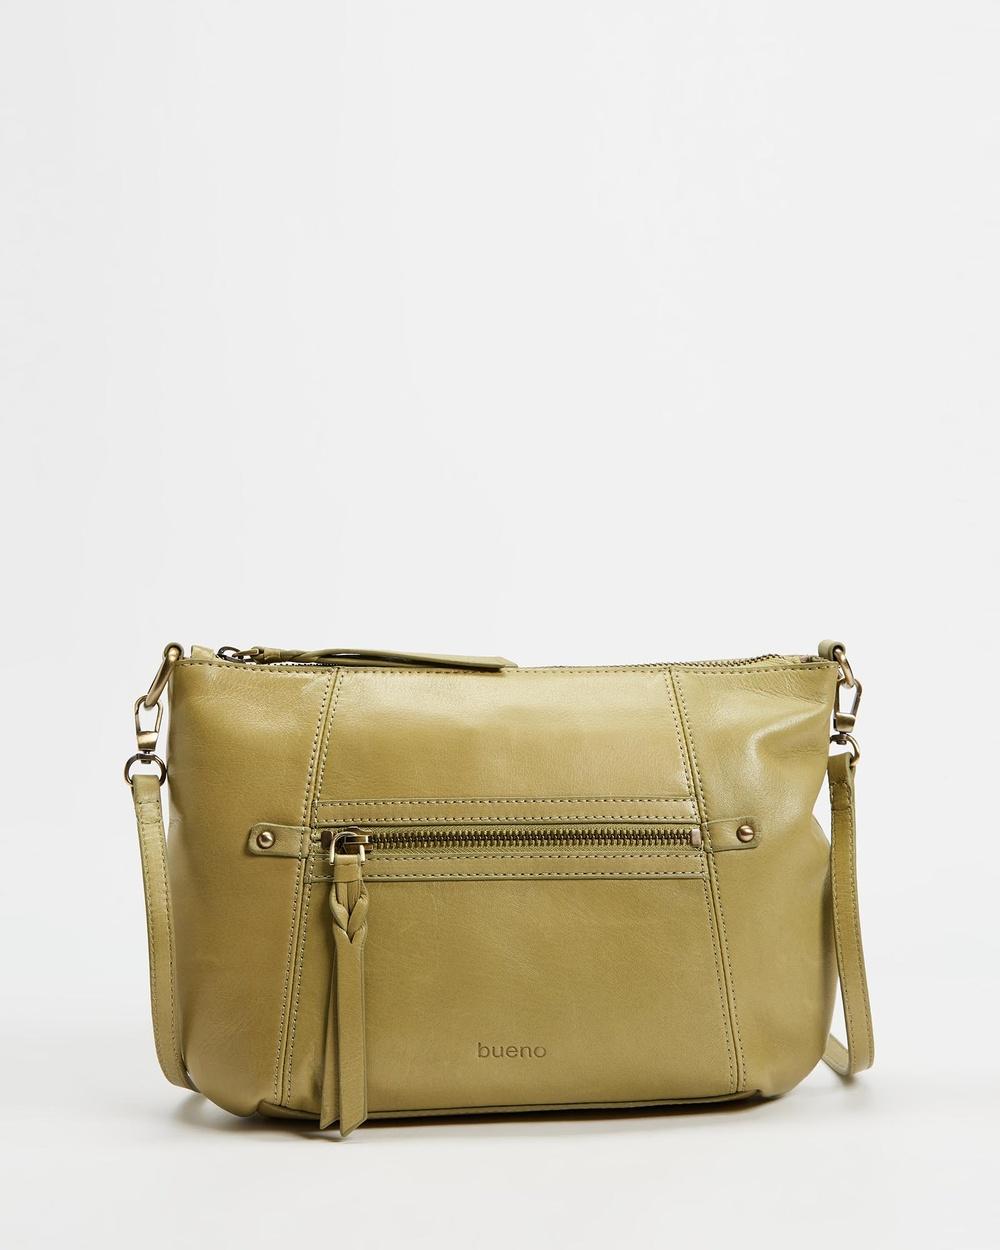 Bueno Diana Handbags Scorpion